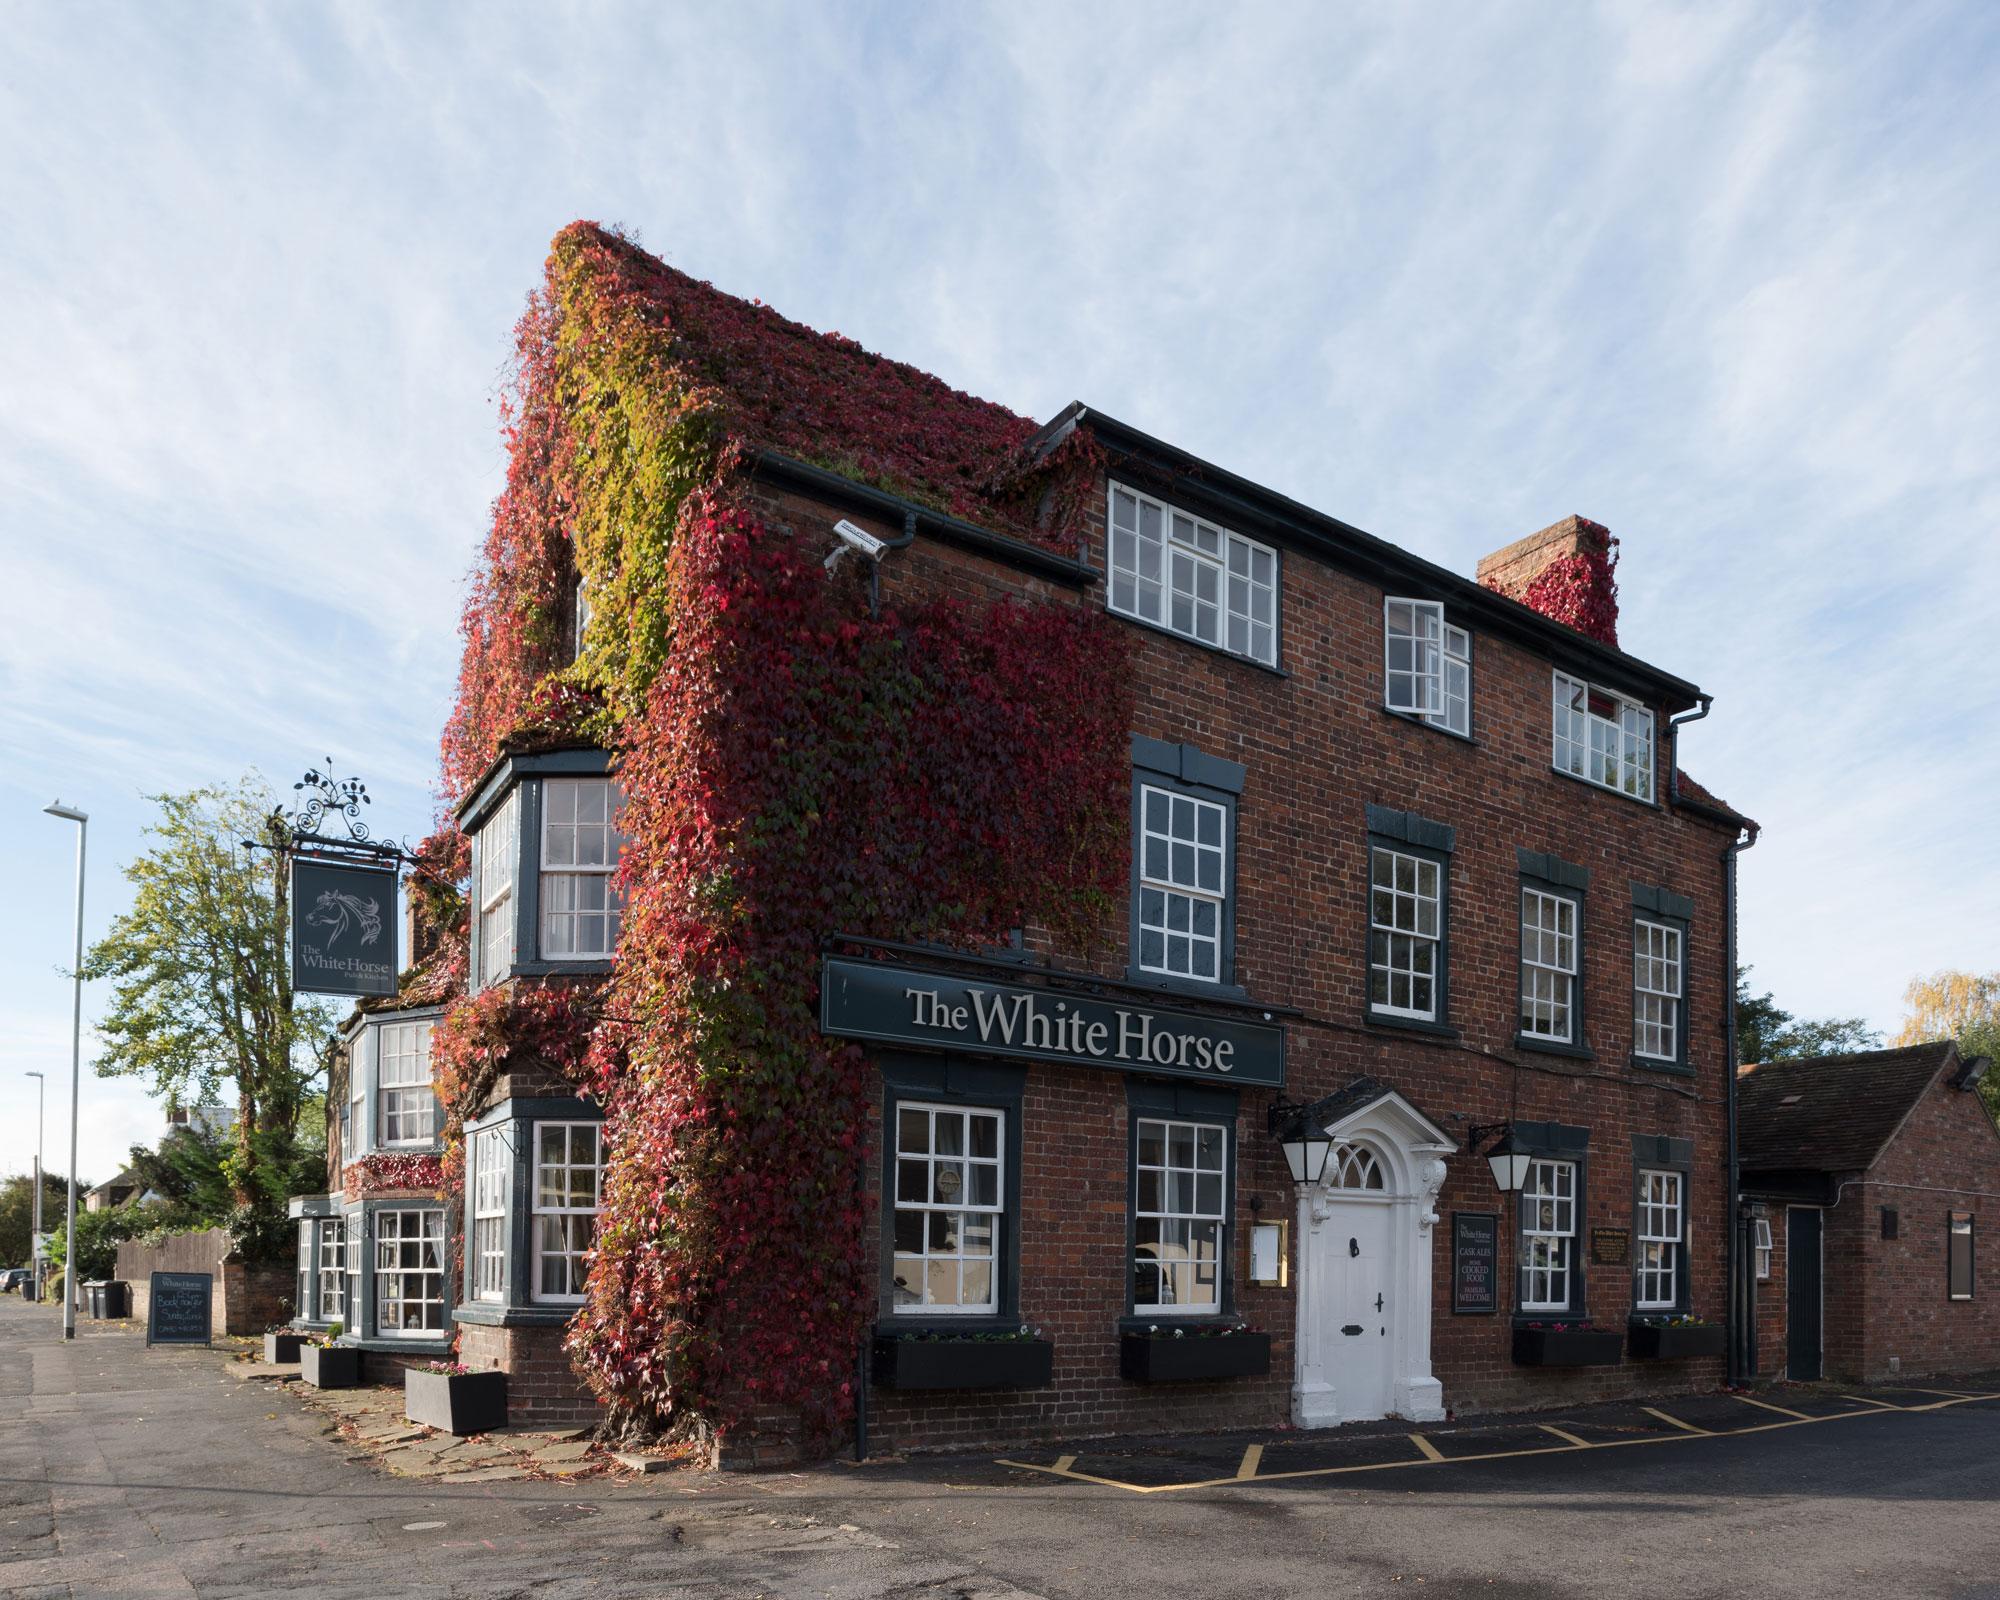 Unedited photo of a pub in Cambridgeshire